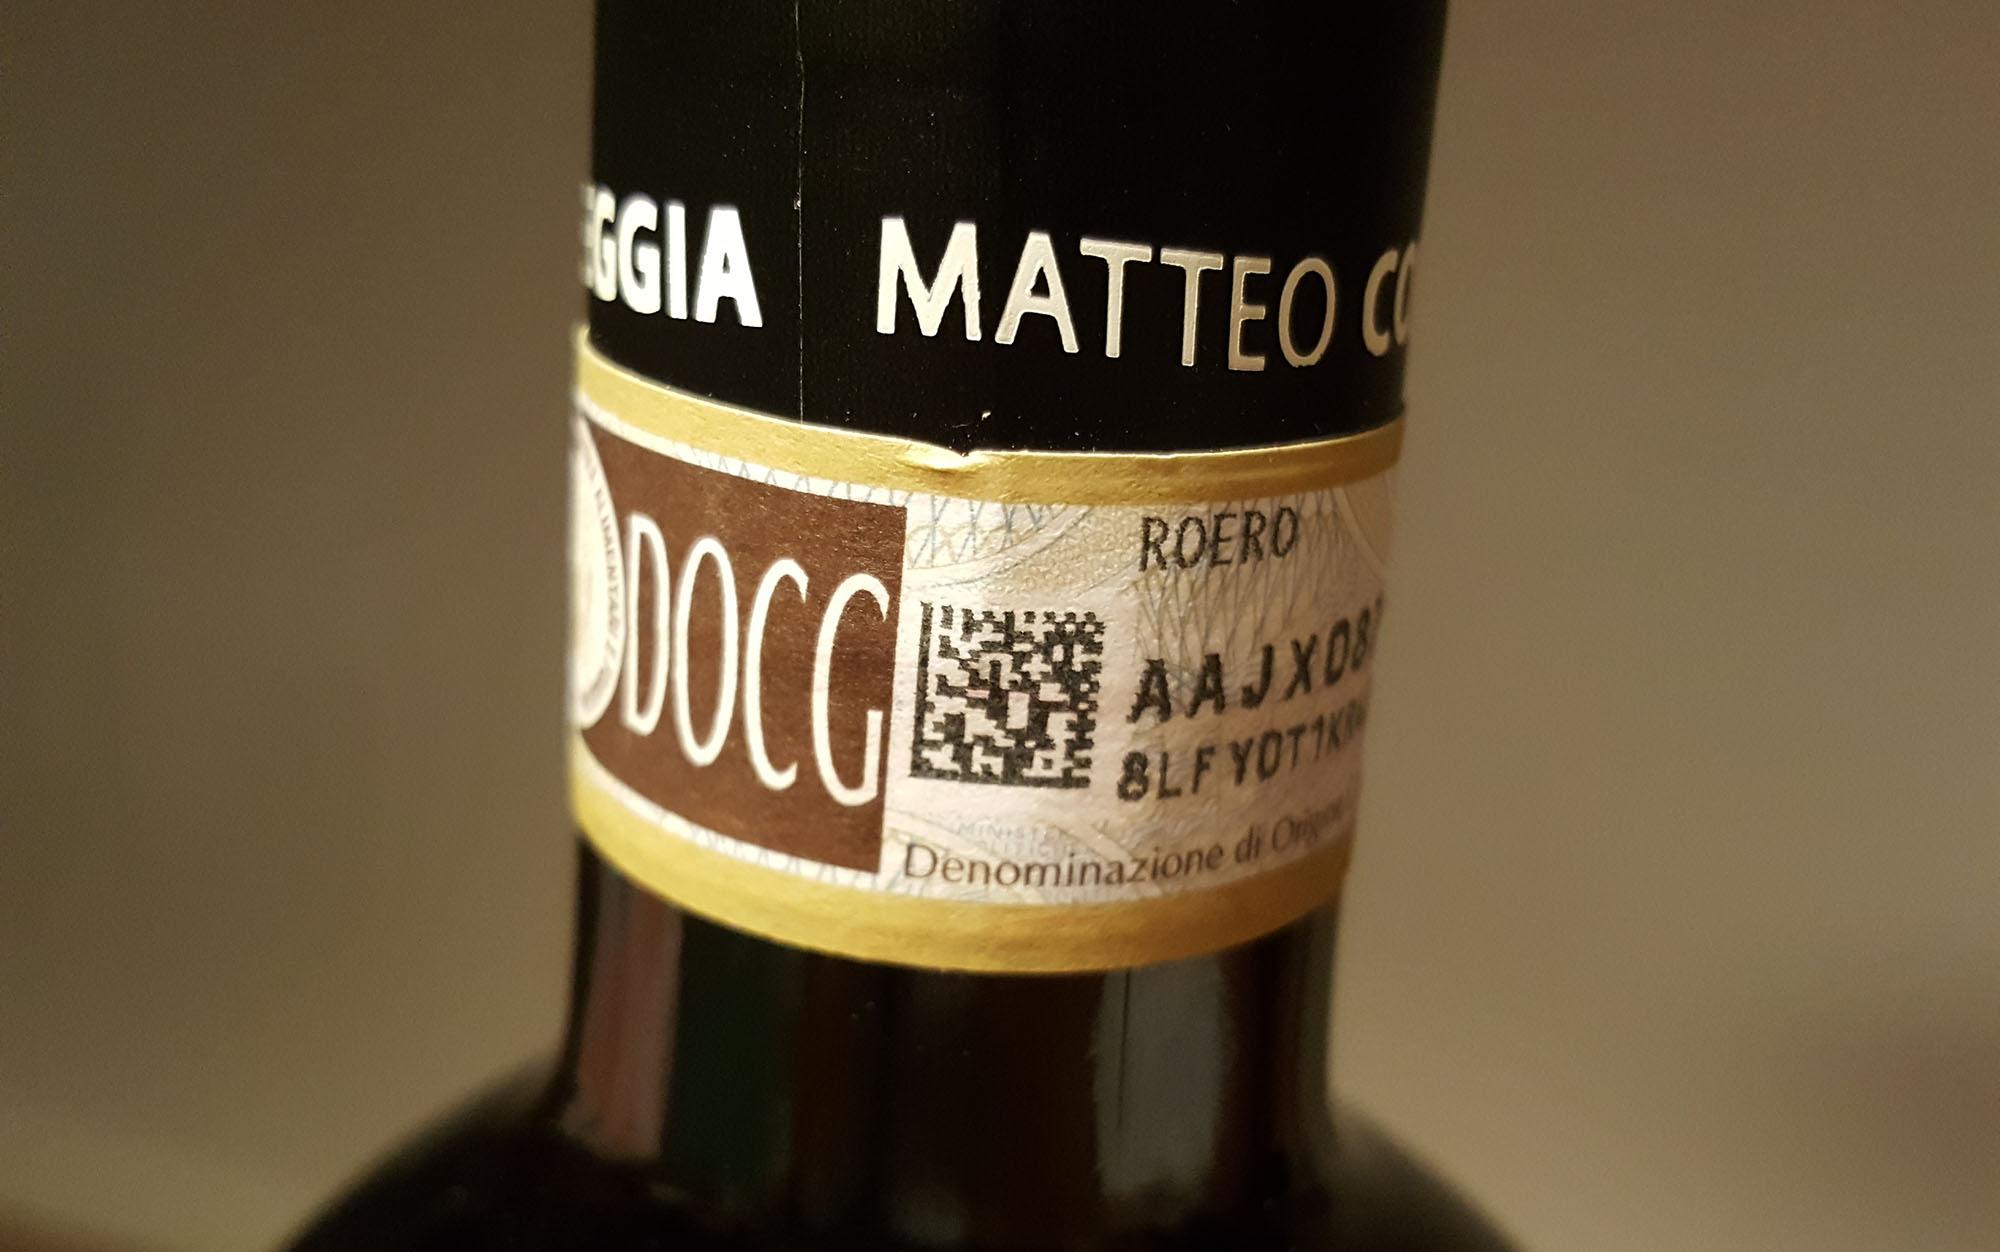 DOCG wijnen